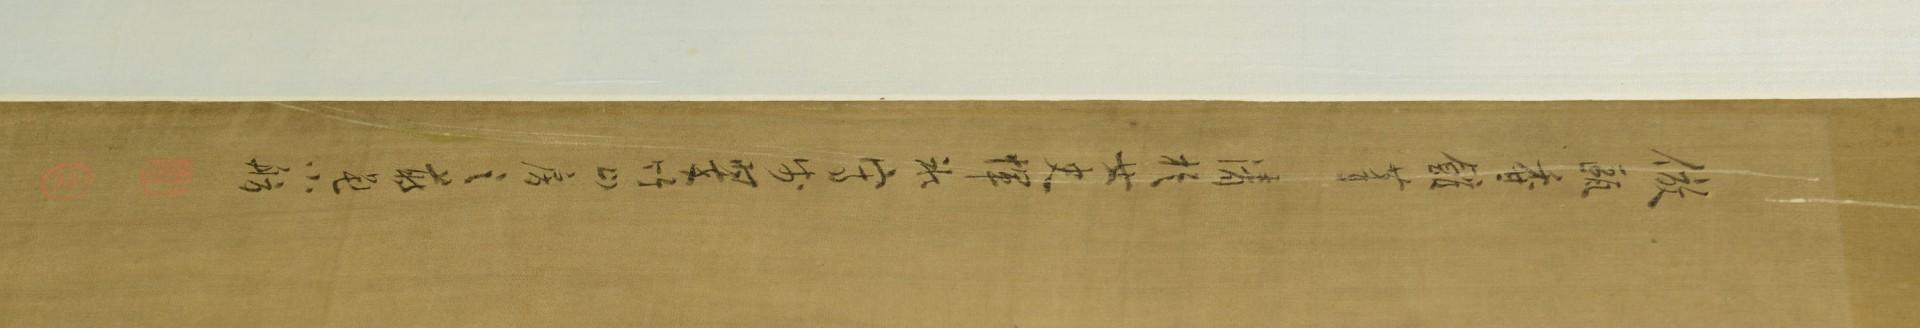 Lot 25: Chinese Scroll of Quail, Qing